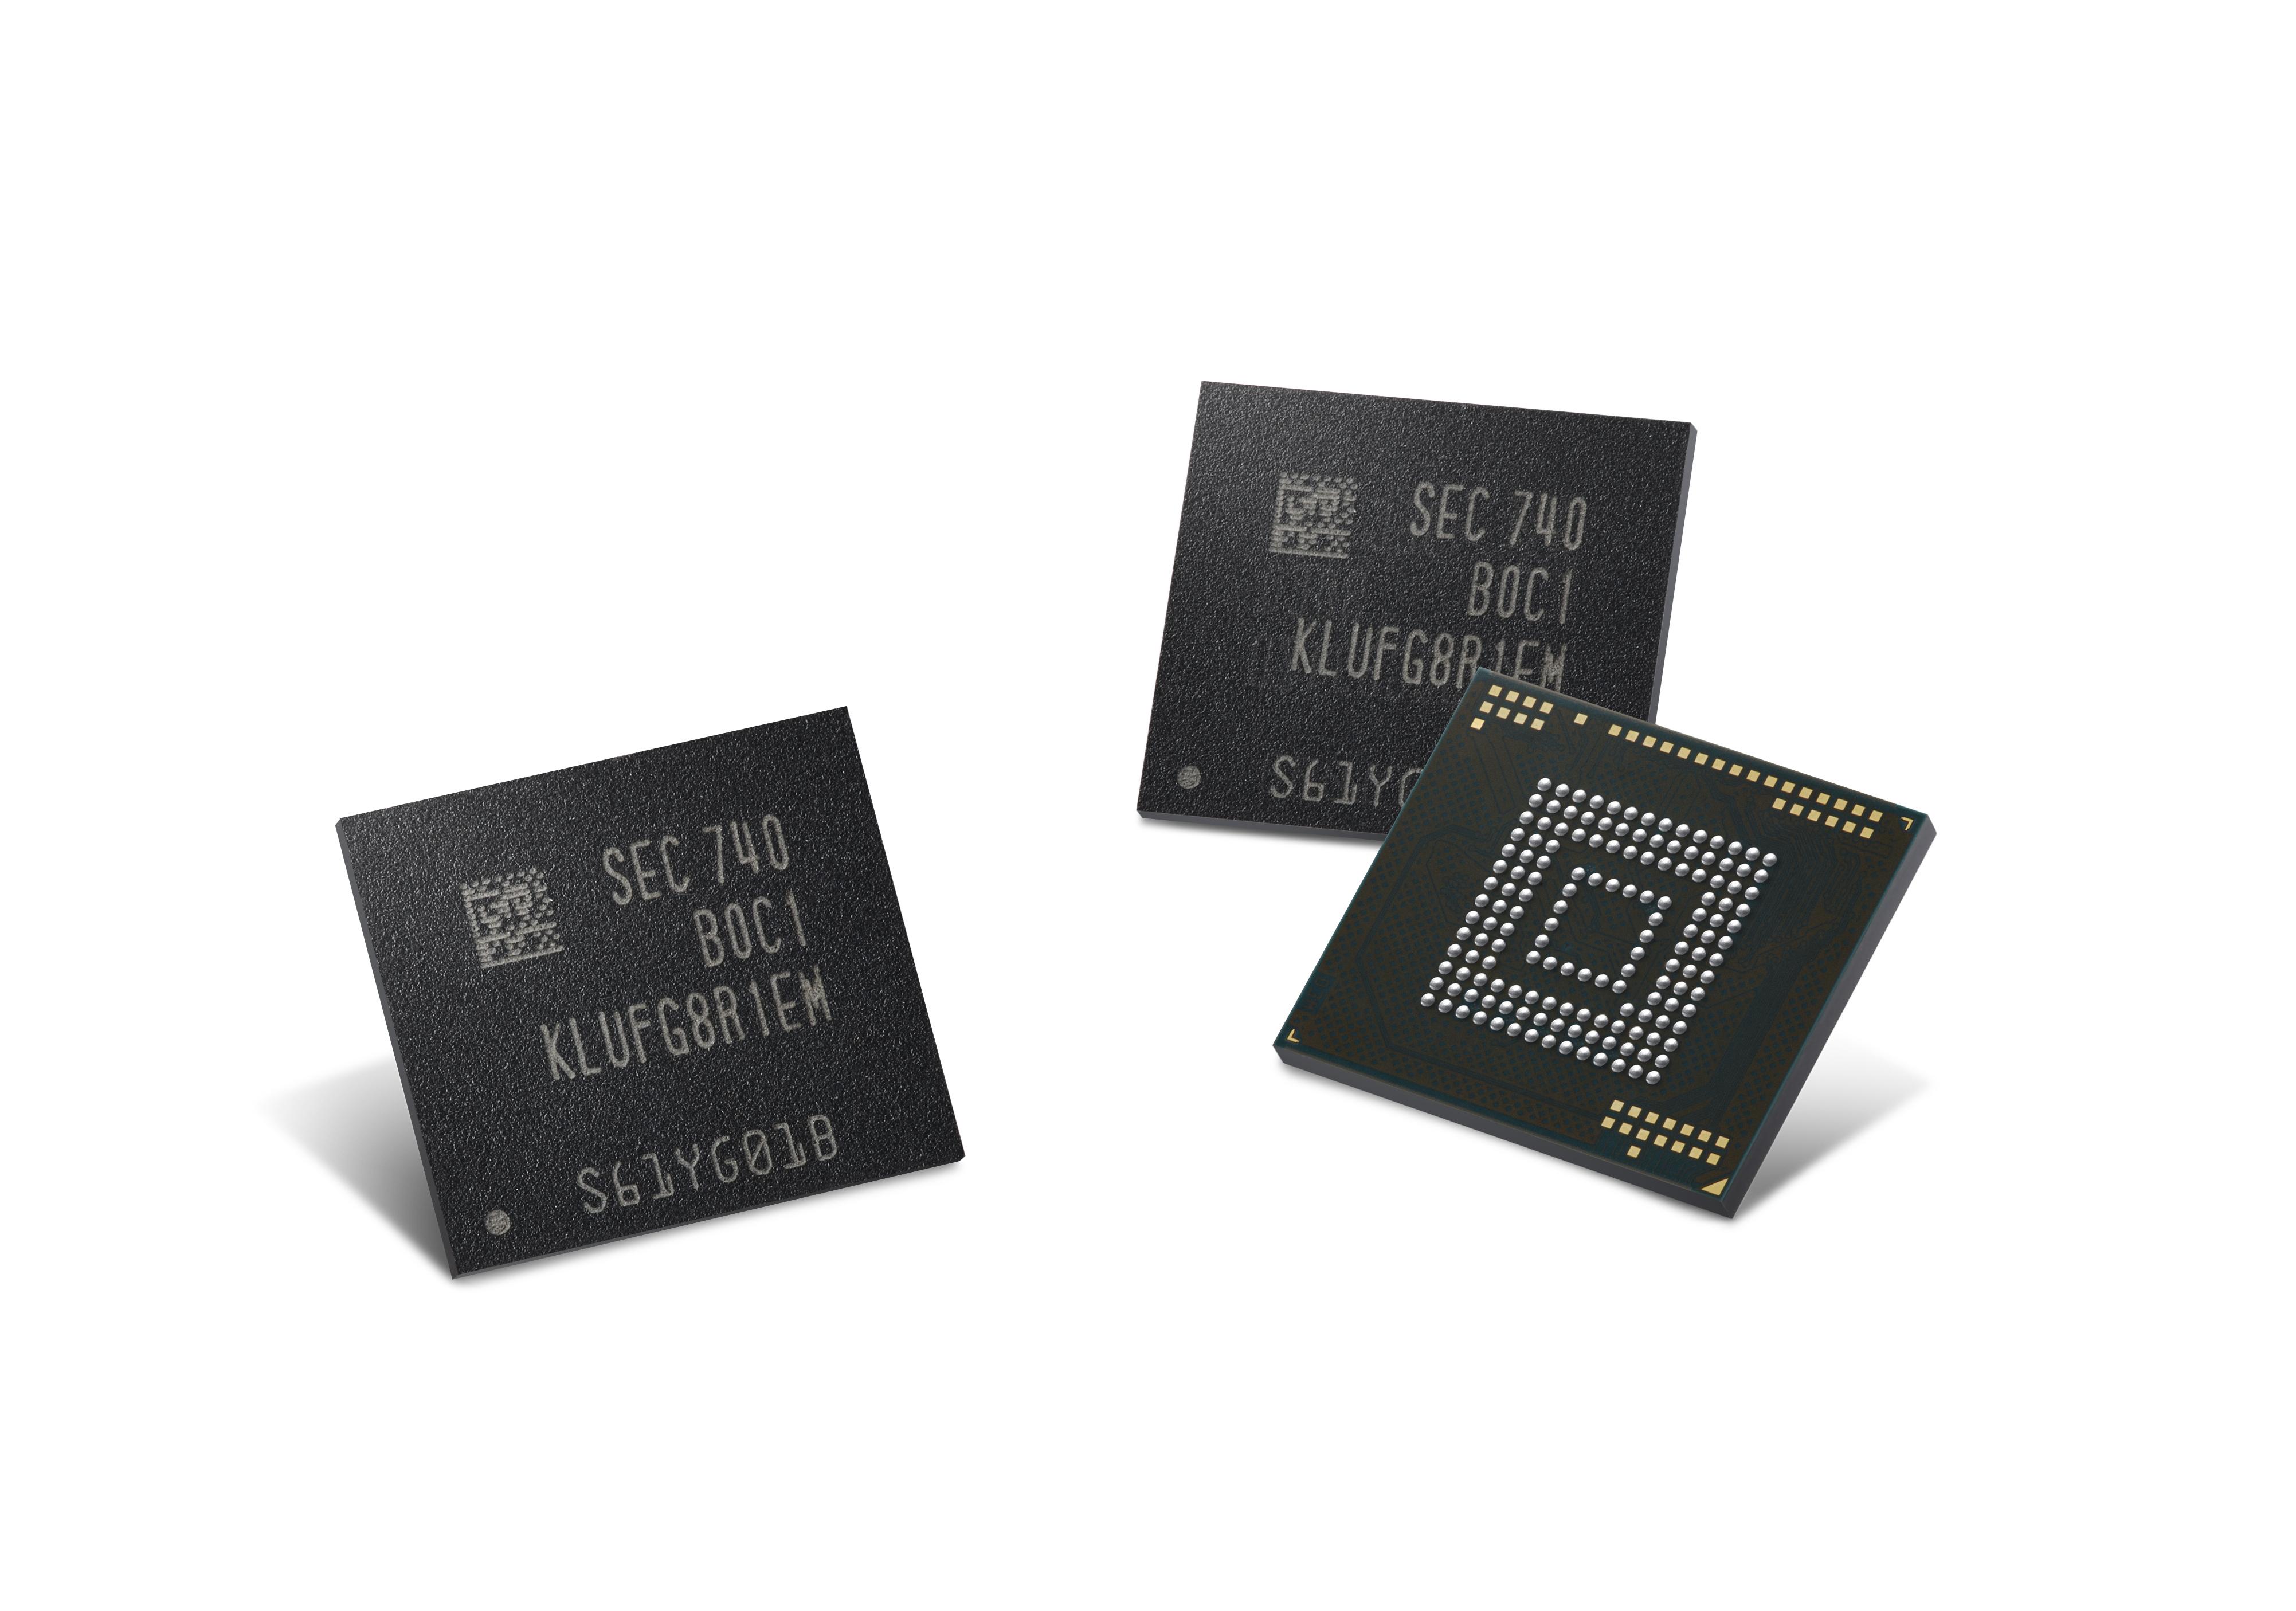 Samsung Starts Producing First 512-Gigabyte Universal Flash Storage ...